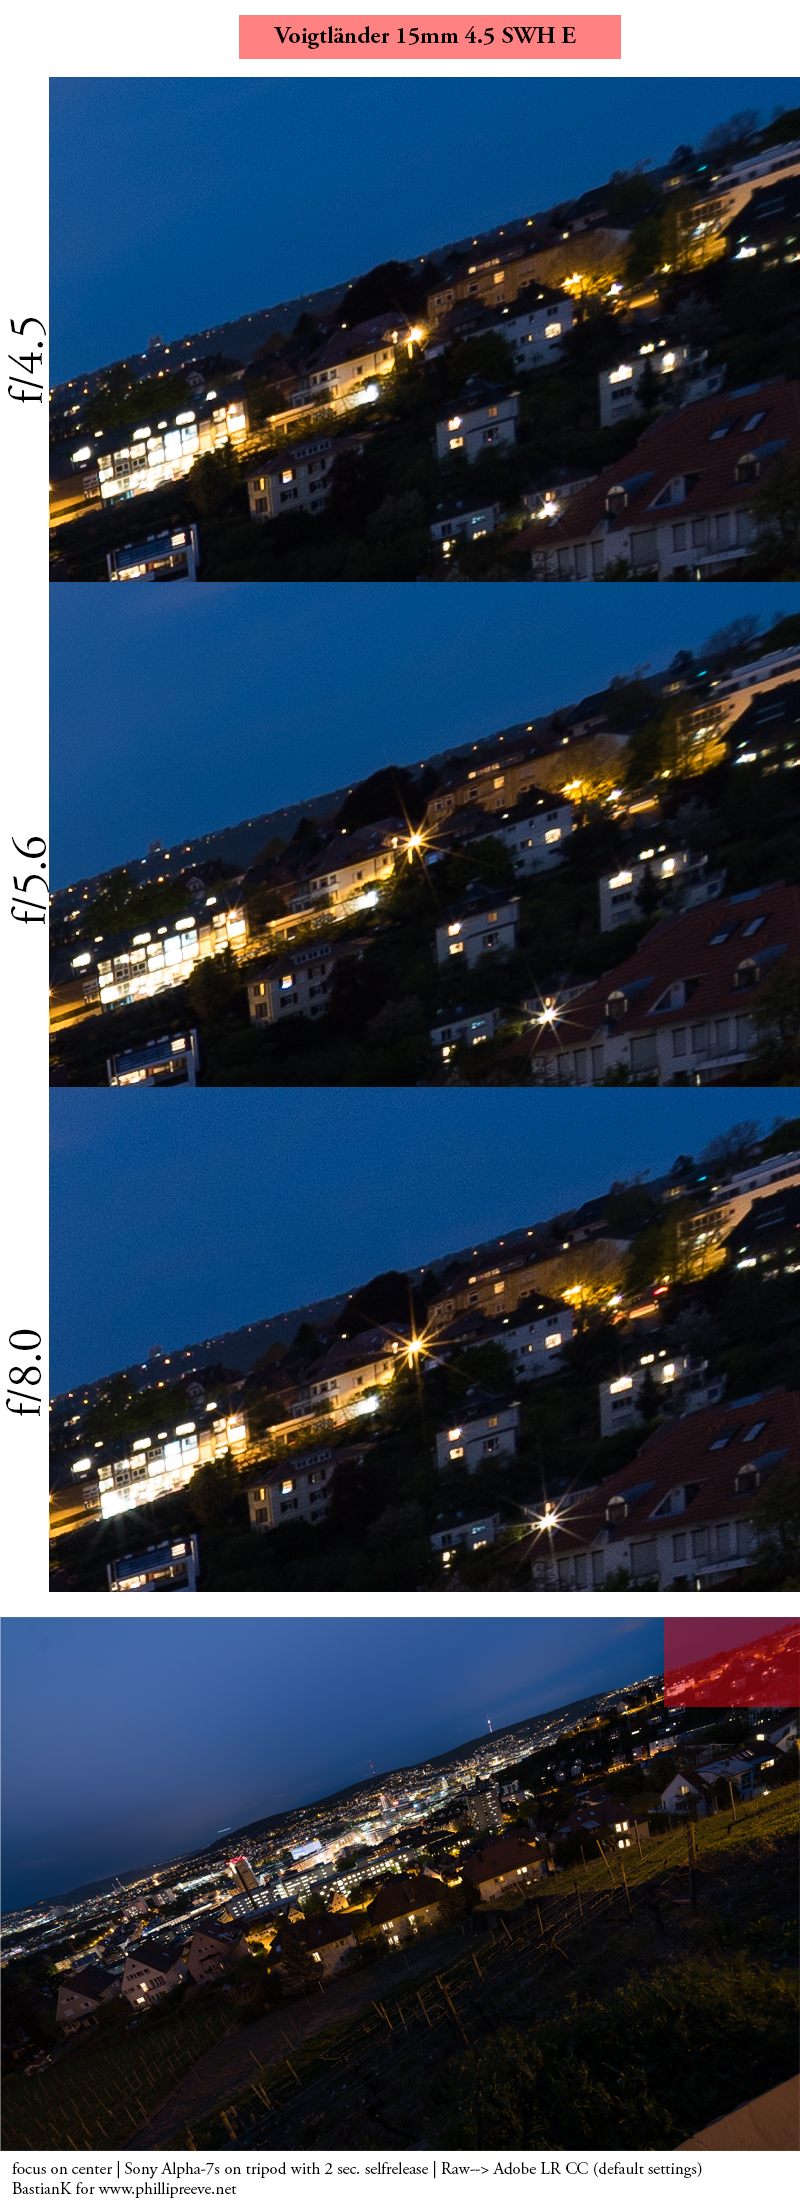 voigtlander 15mm 4.5 E sony emount a7 a7r a7s coma stars nightphotography